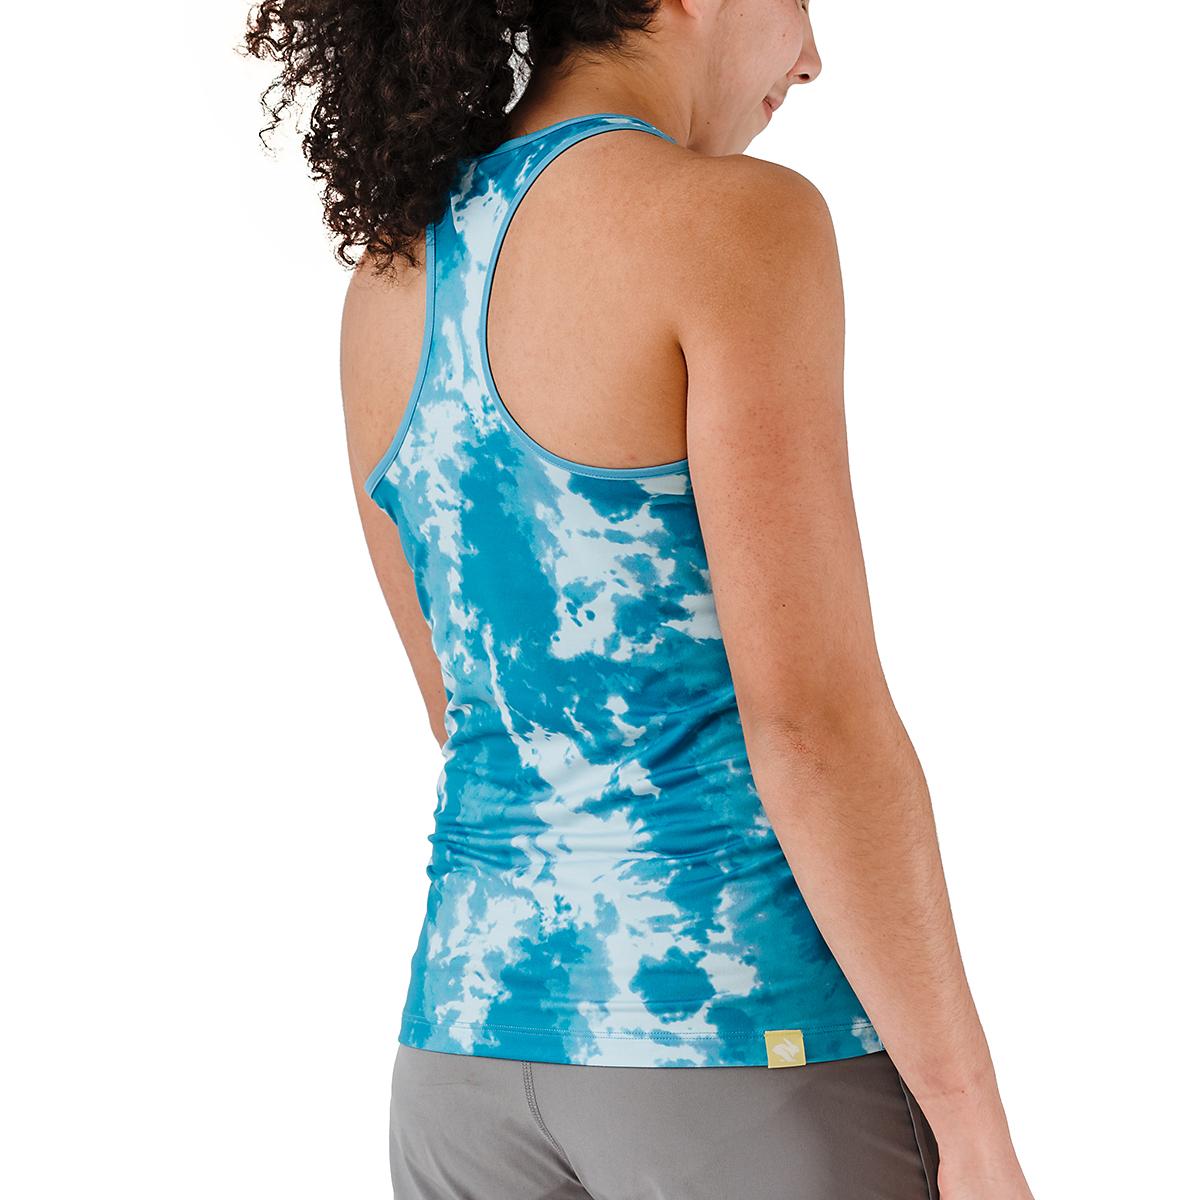 Women's Rabbit Bunny Hop Tank - JackRabbit Exclusive  - Color: Ipanema Tie Dye - Size: XS, Ipanema Tie Dye, large, image 2